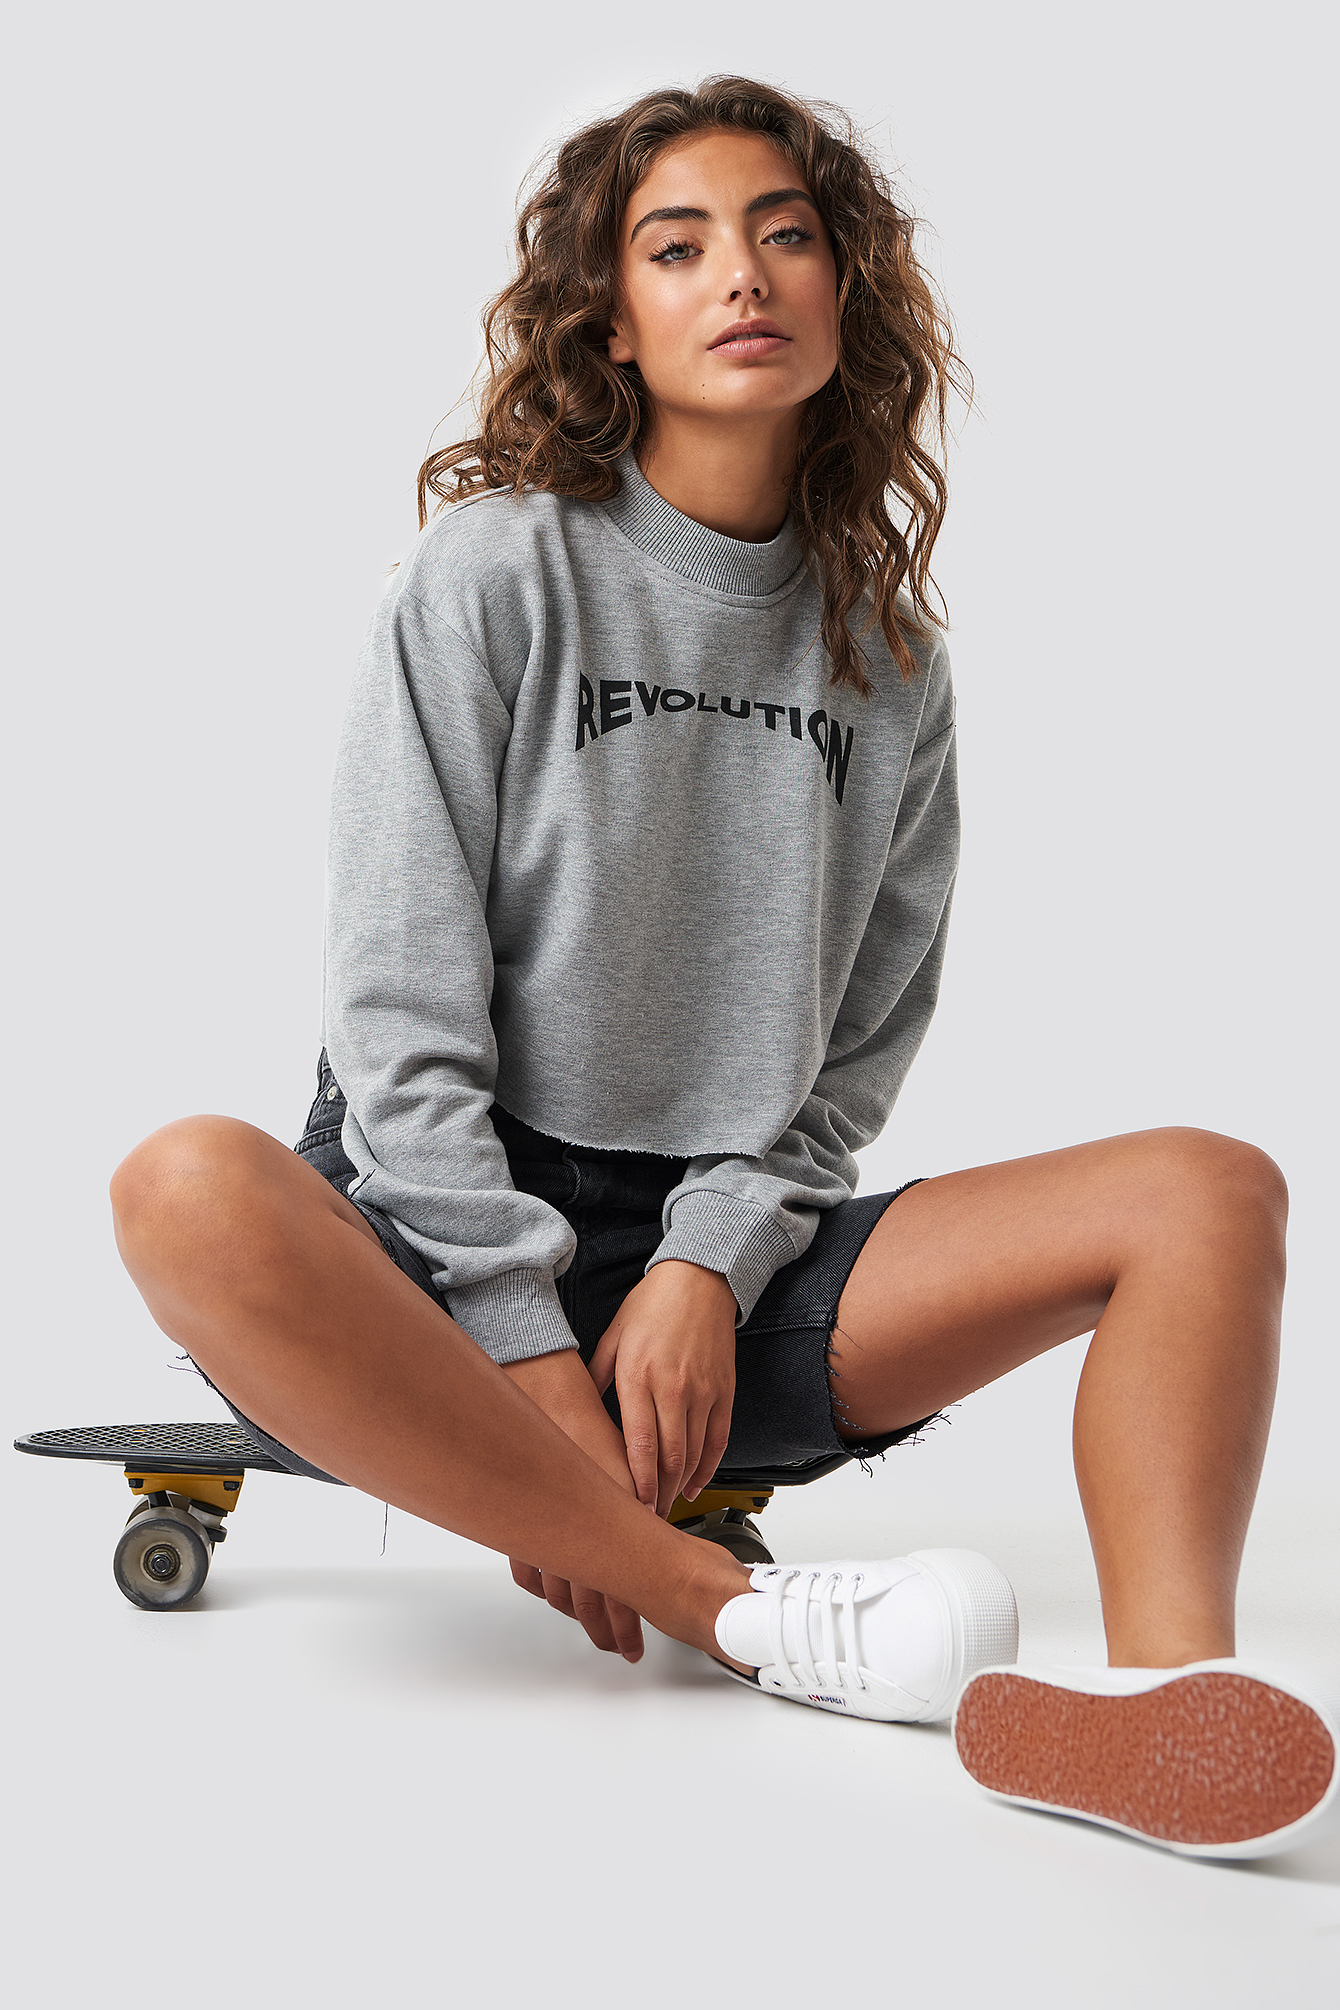 ASTRID OLSEN X NA-KD Revolution Cropped Sweater - Grey